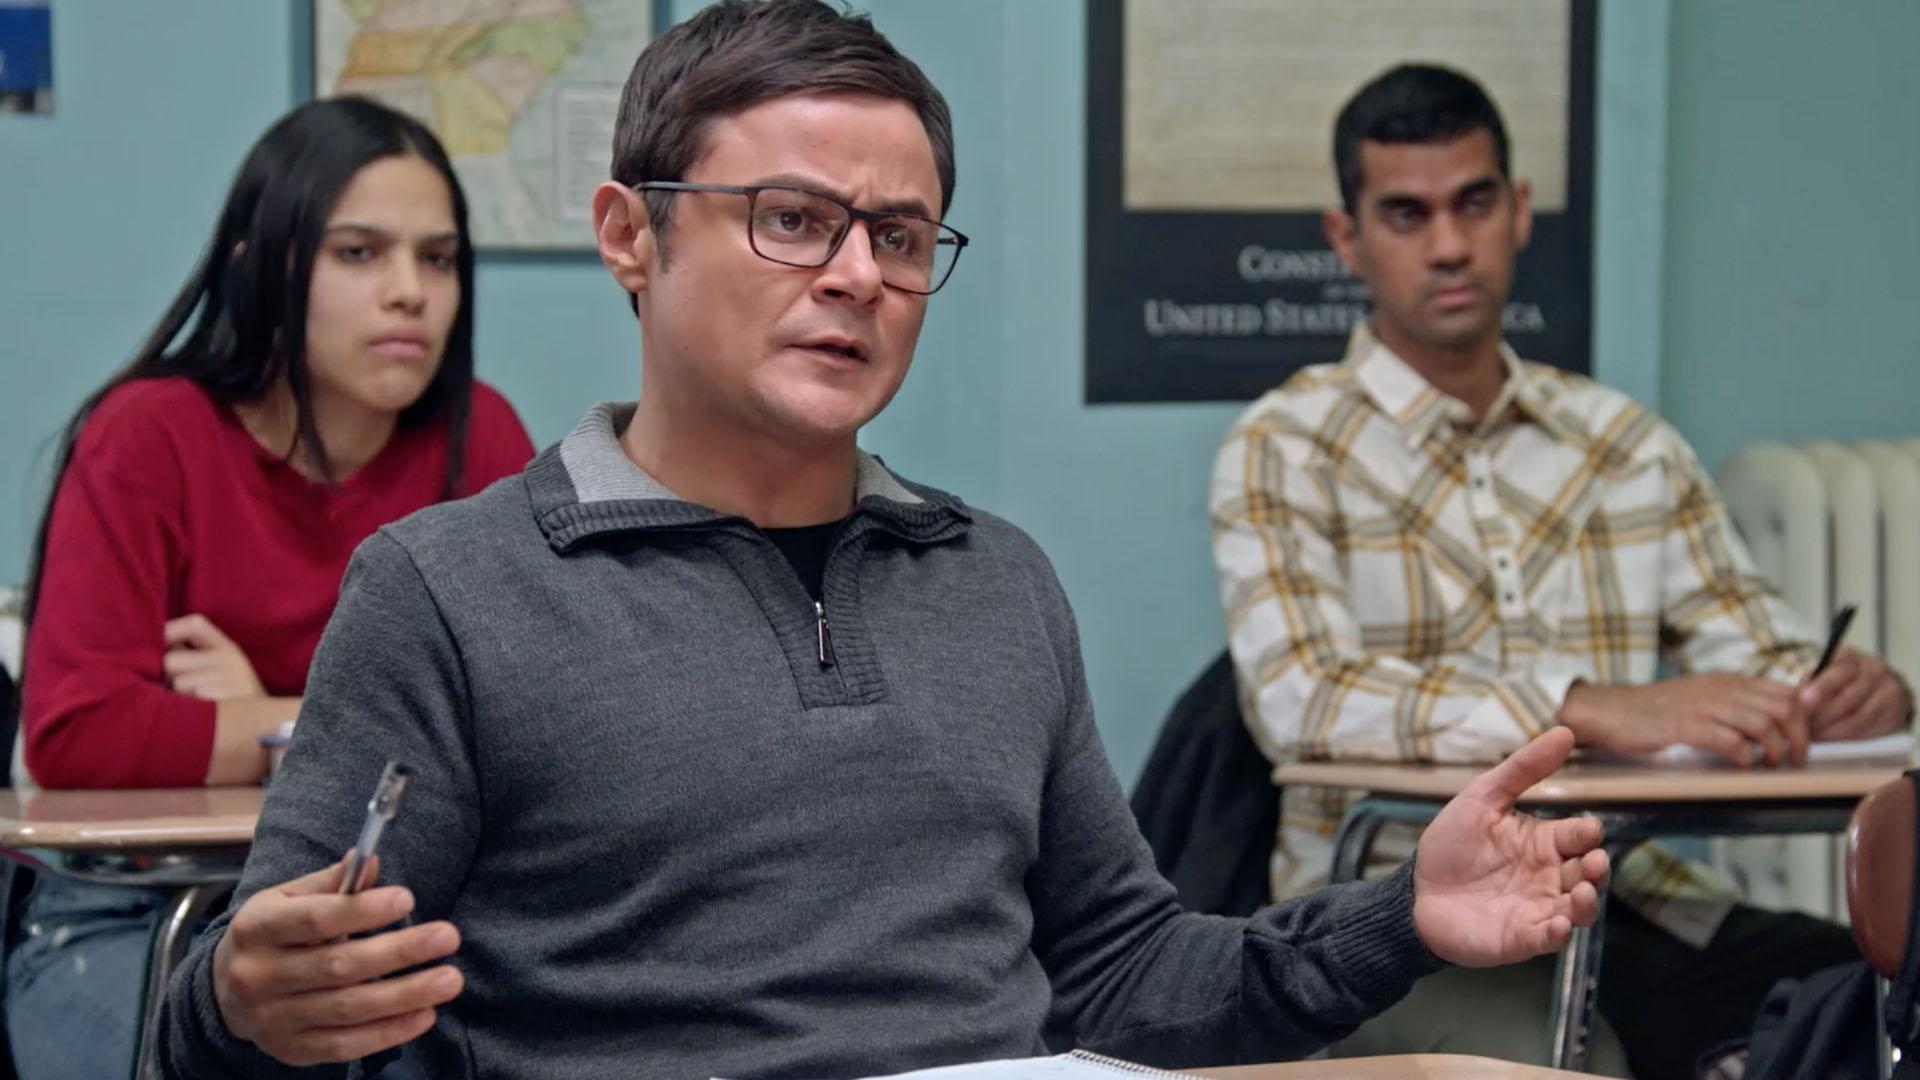 Welcome to America': Arturo Castro on why random mass shootings make